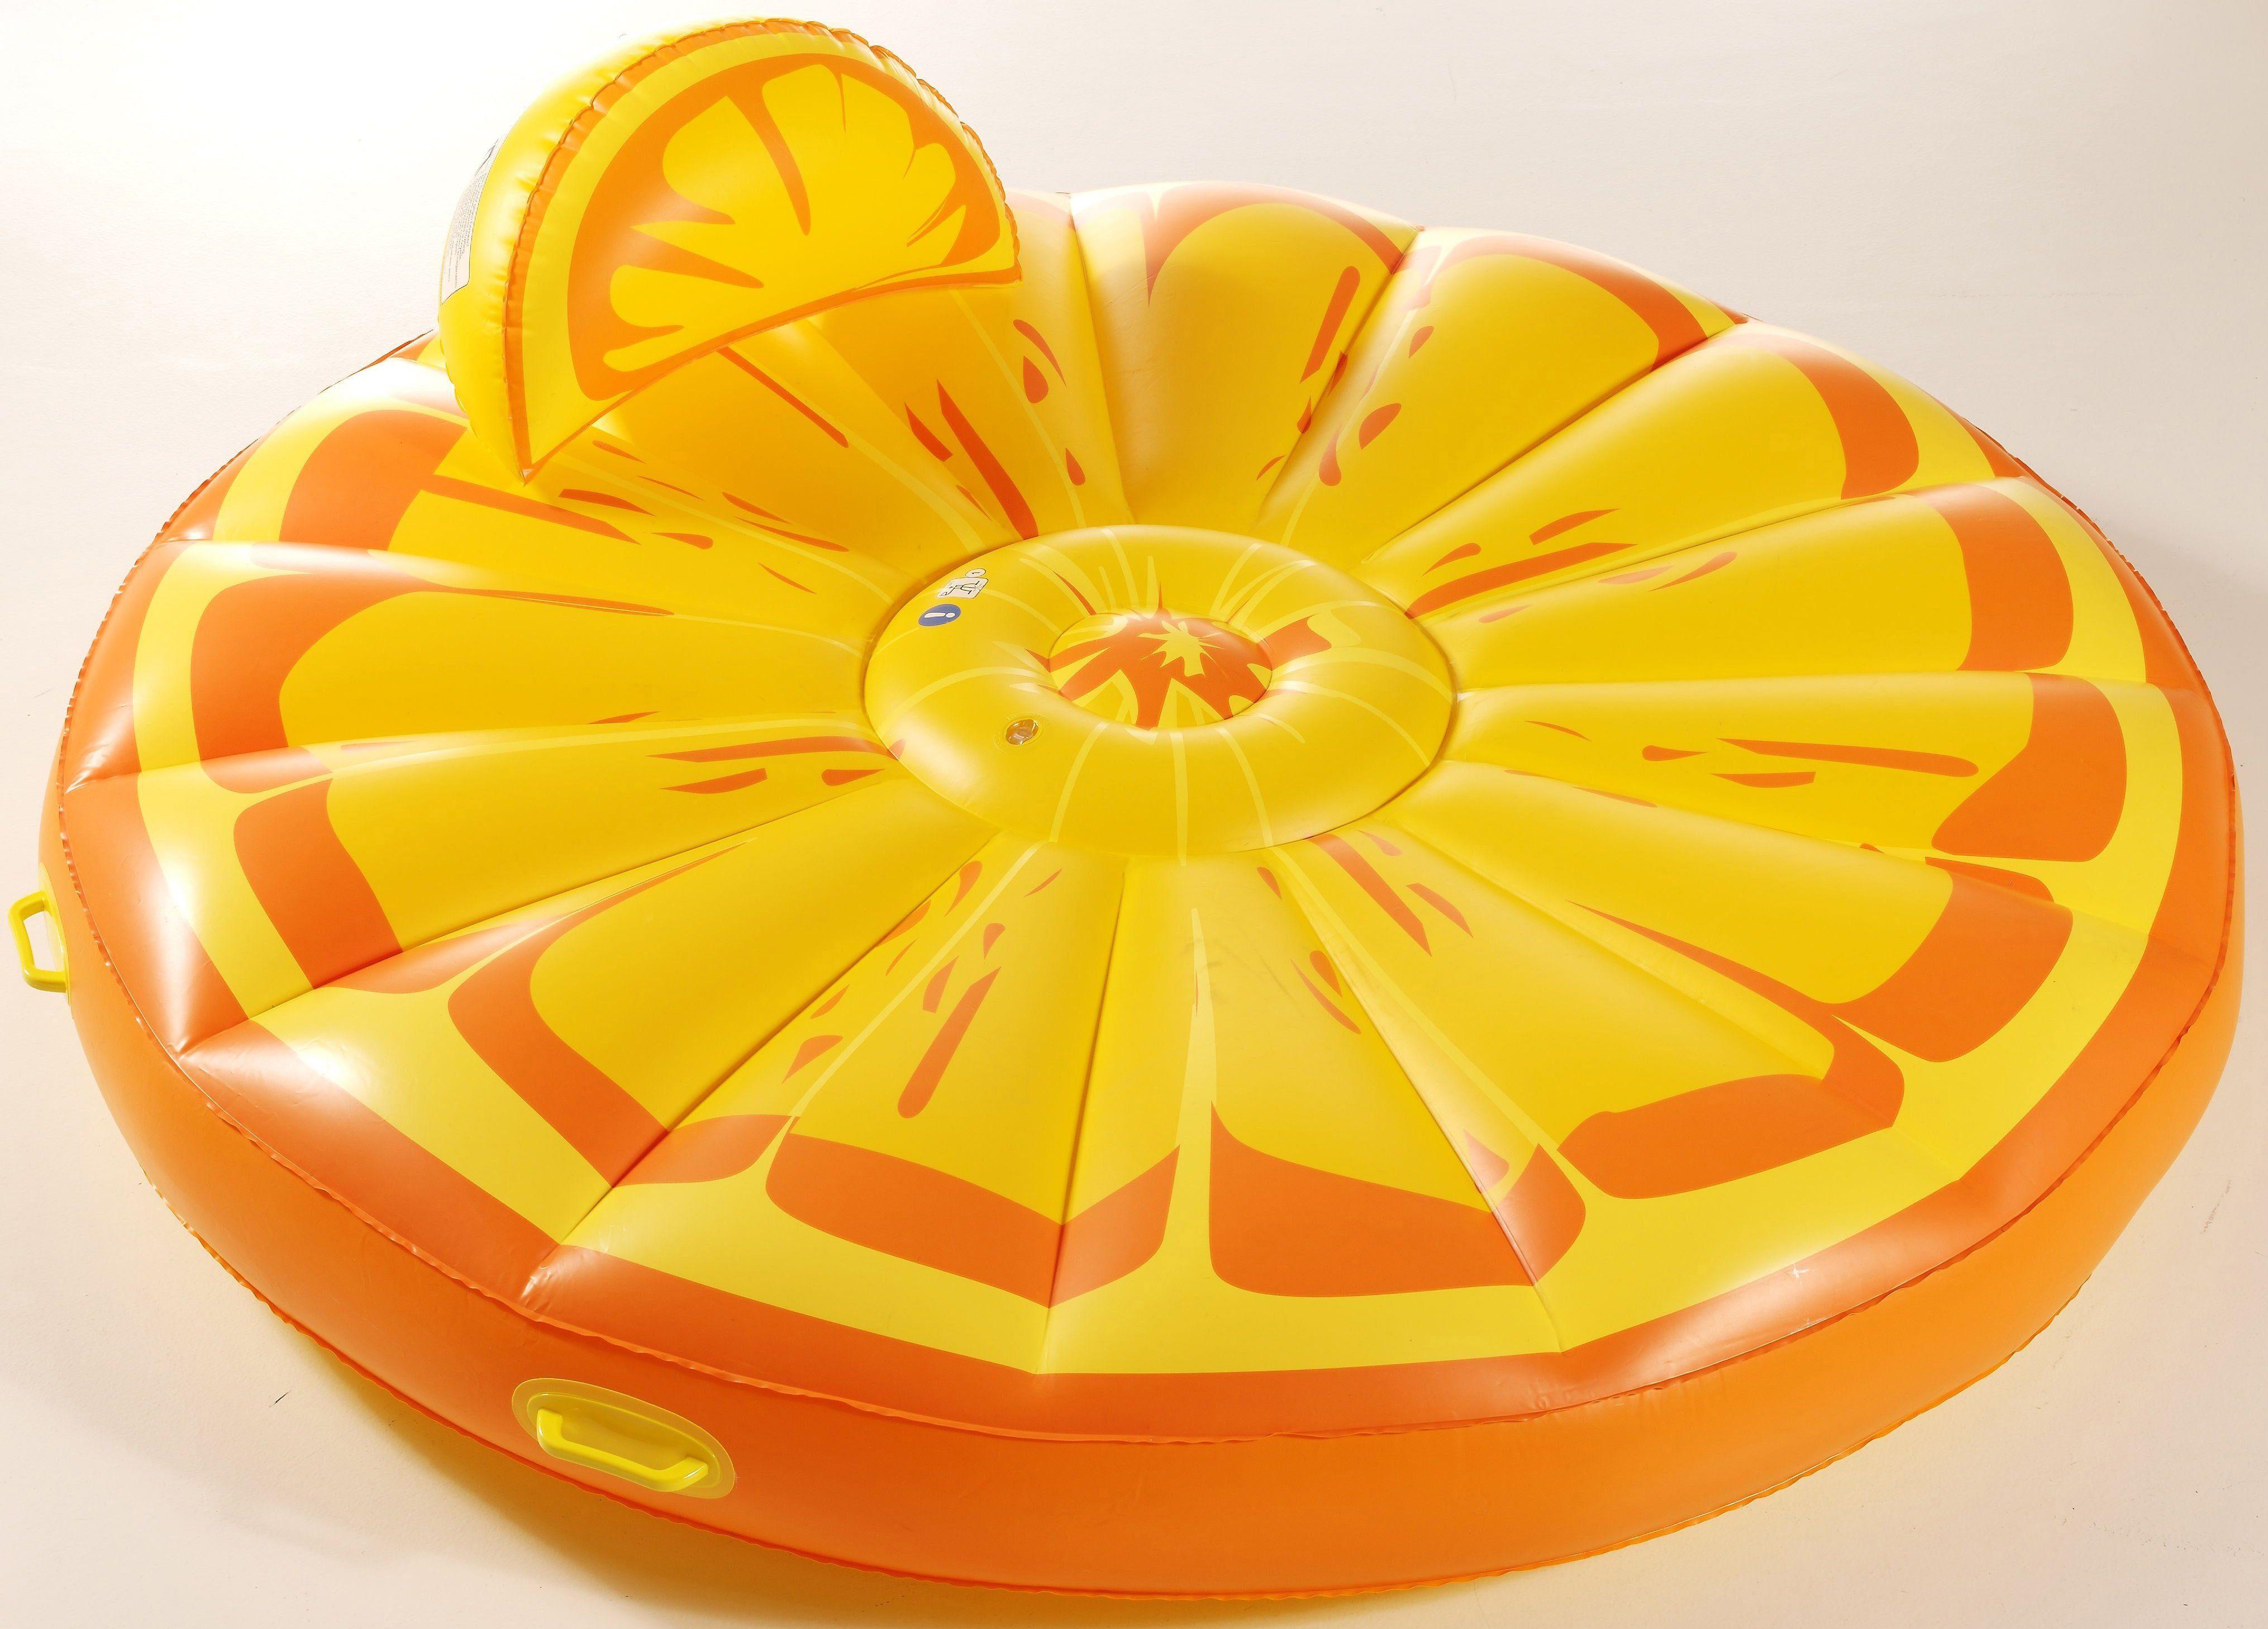 Royalbeach® Badeinsel mit abnehmbarer Kopfstütze, Ø ca. 180 cm, »Orange Island«